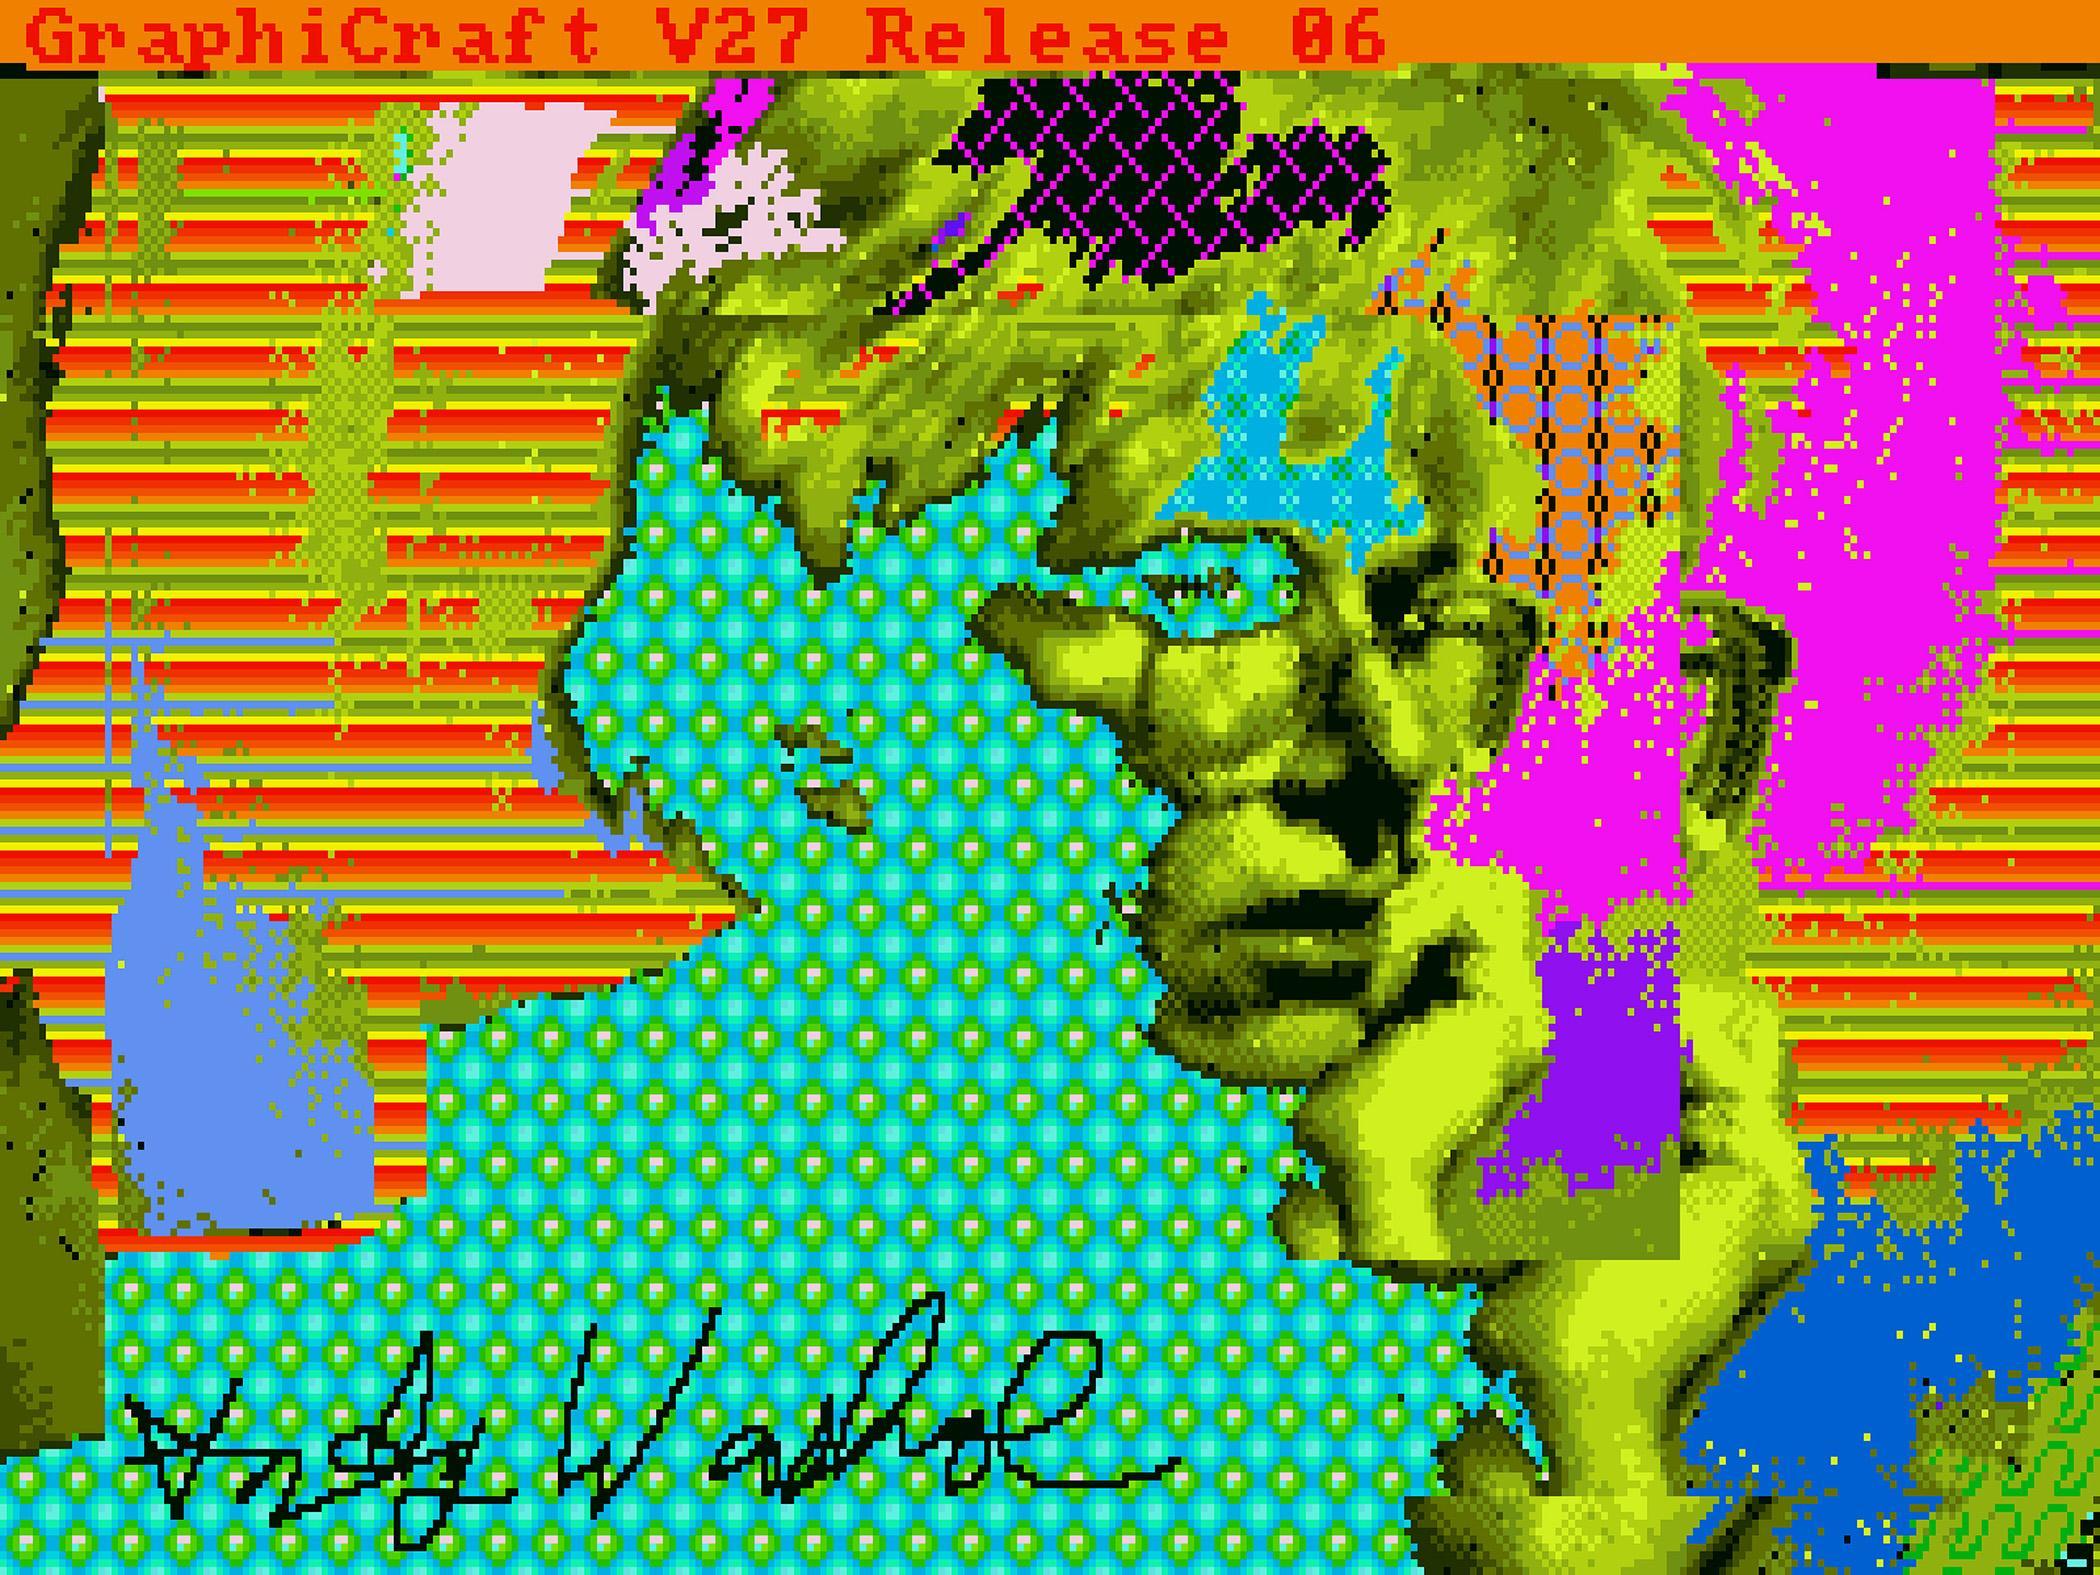 Digital Computer Art : Digital art from andy warhol rediscovered on floppy disks